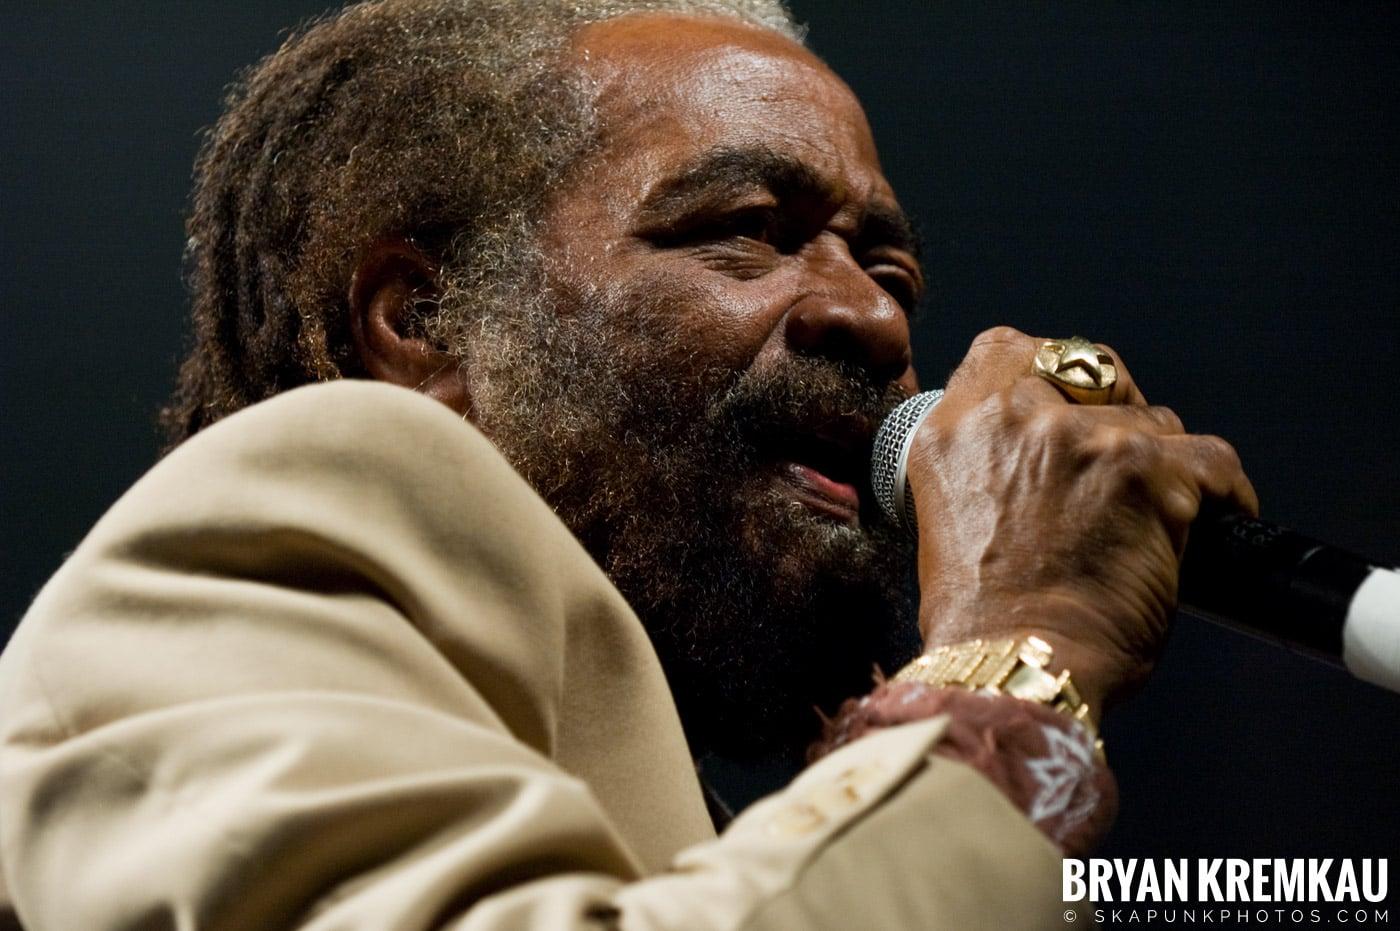 John Holt @ Vintage Reggae Fest - Hammerstein Ballroom, NYC - 12.16.07 (4)